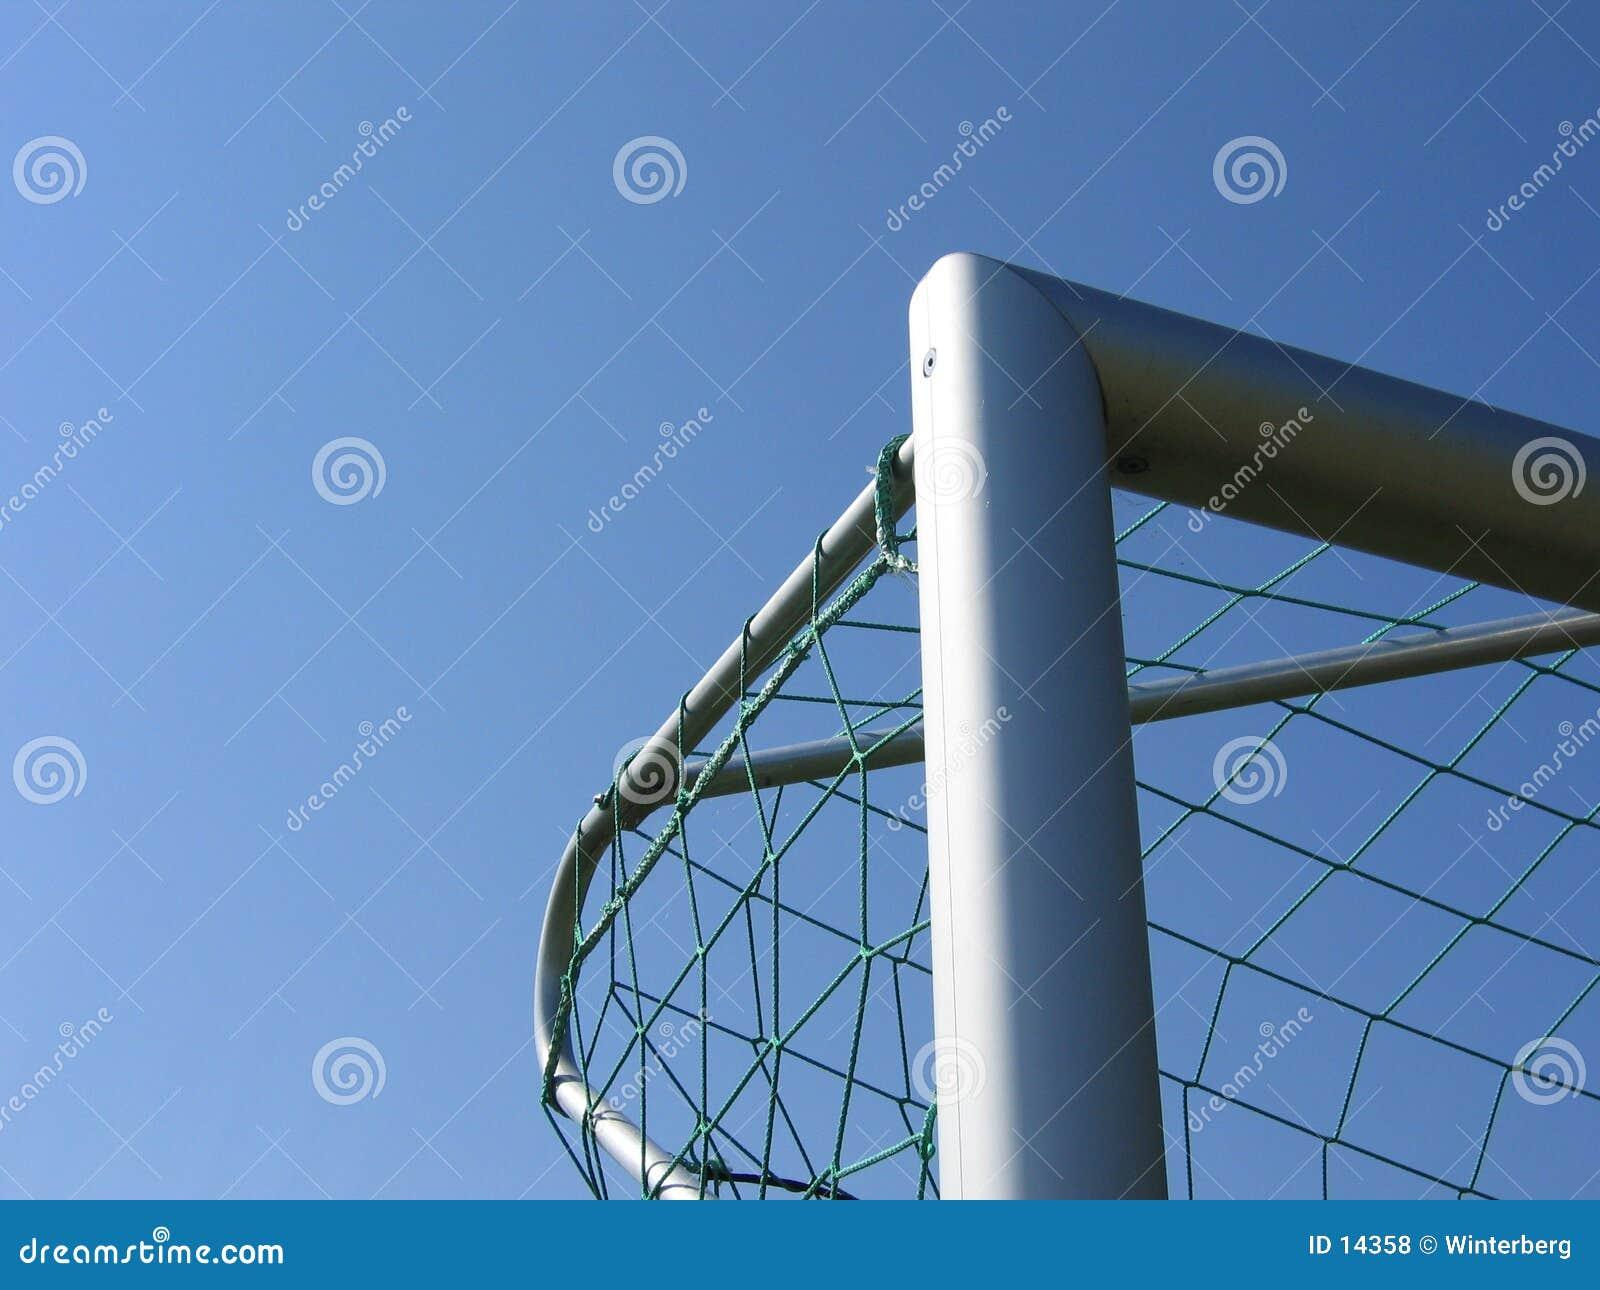 Piłka nożna target za rogiem